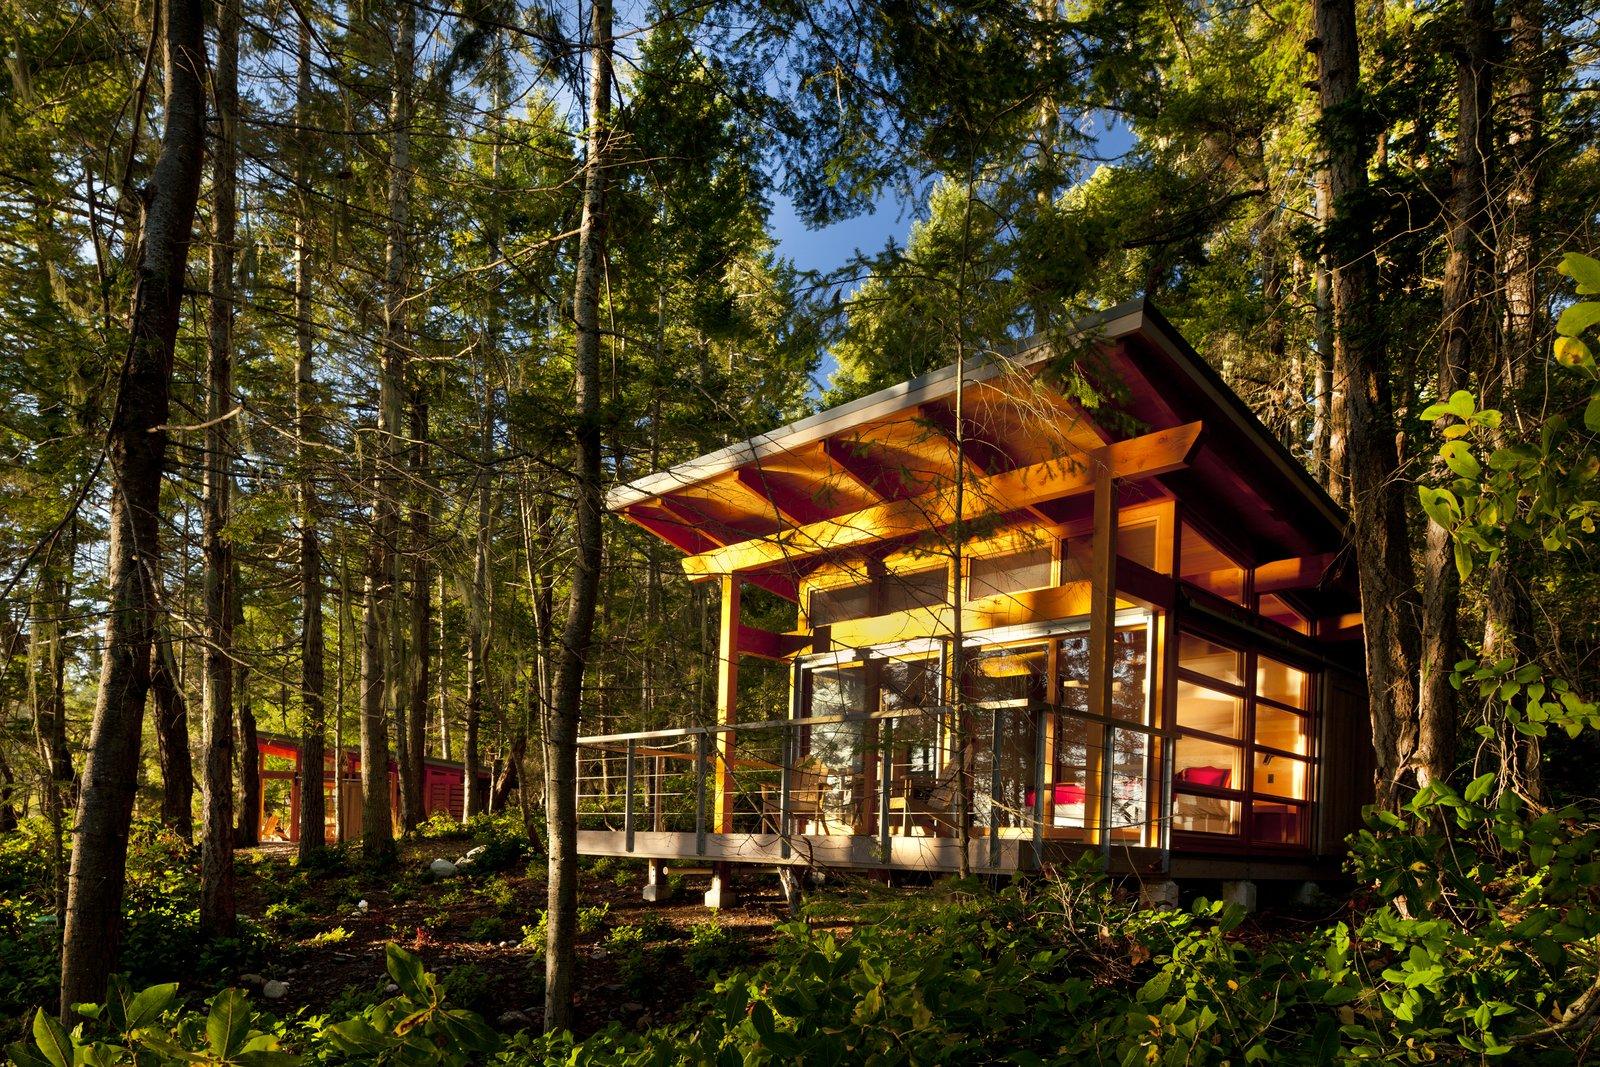 Gulf Cabins By Osburn/Clarke